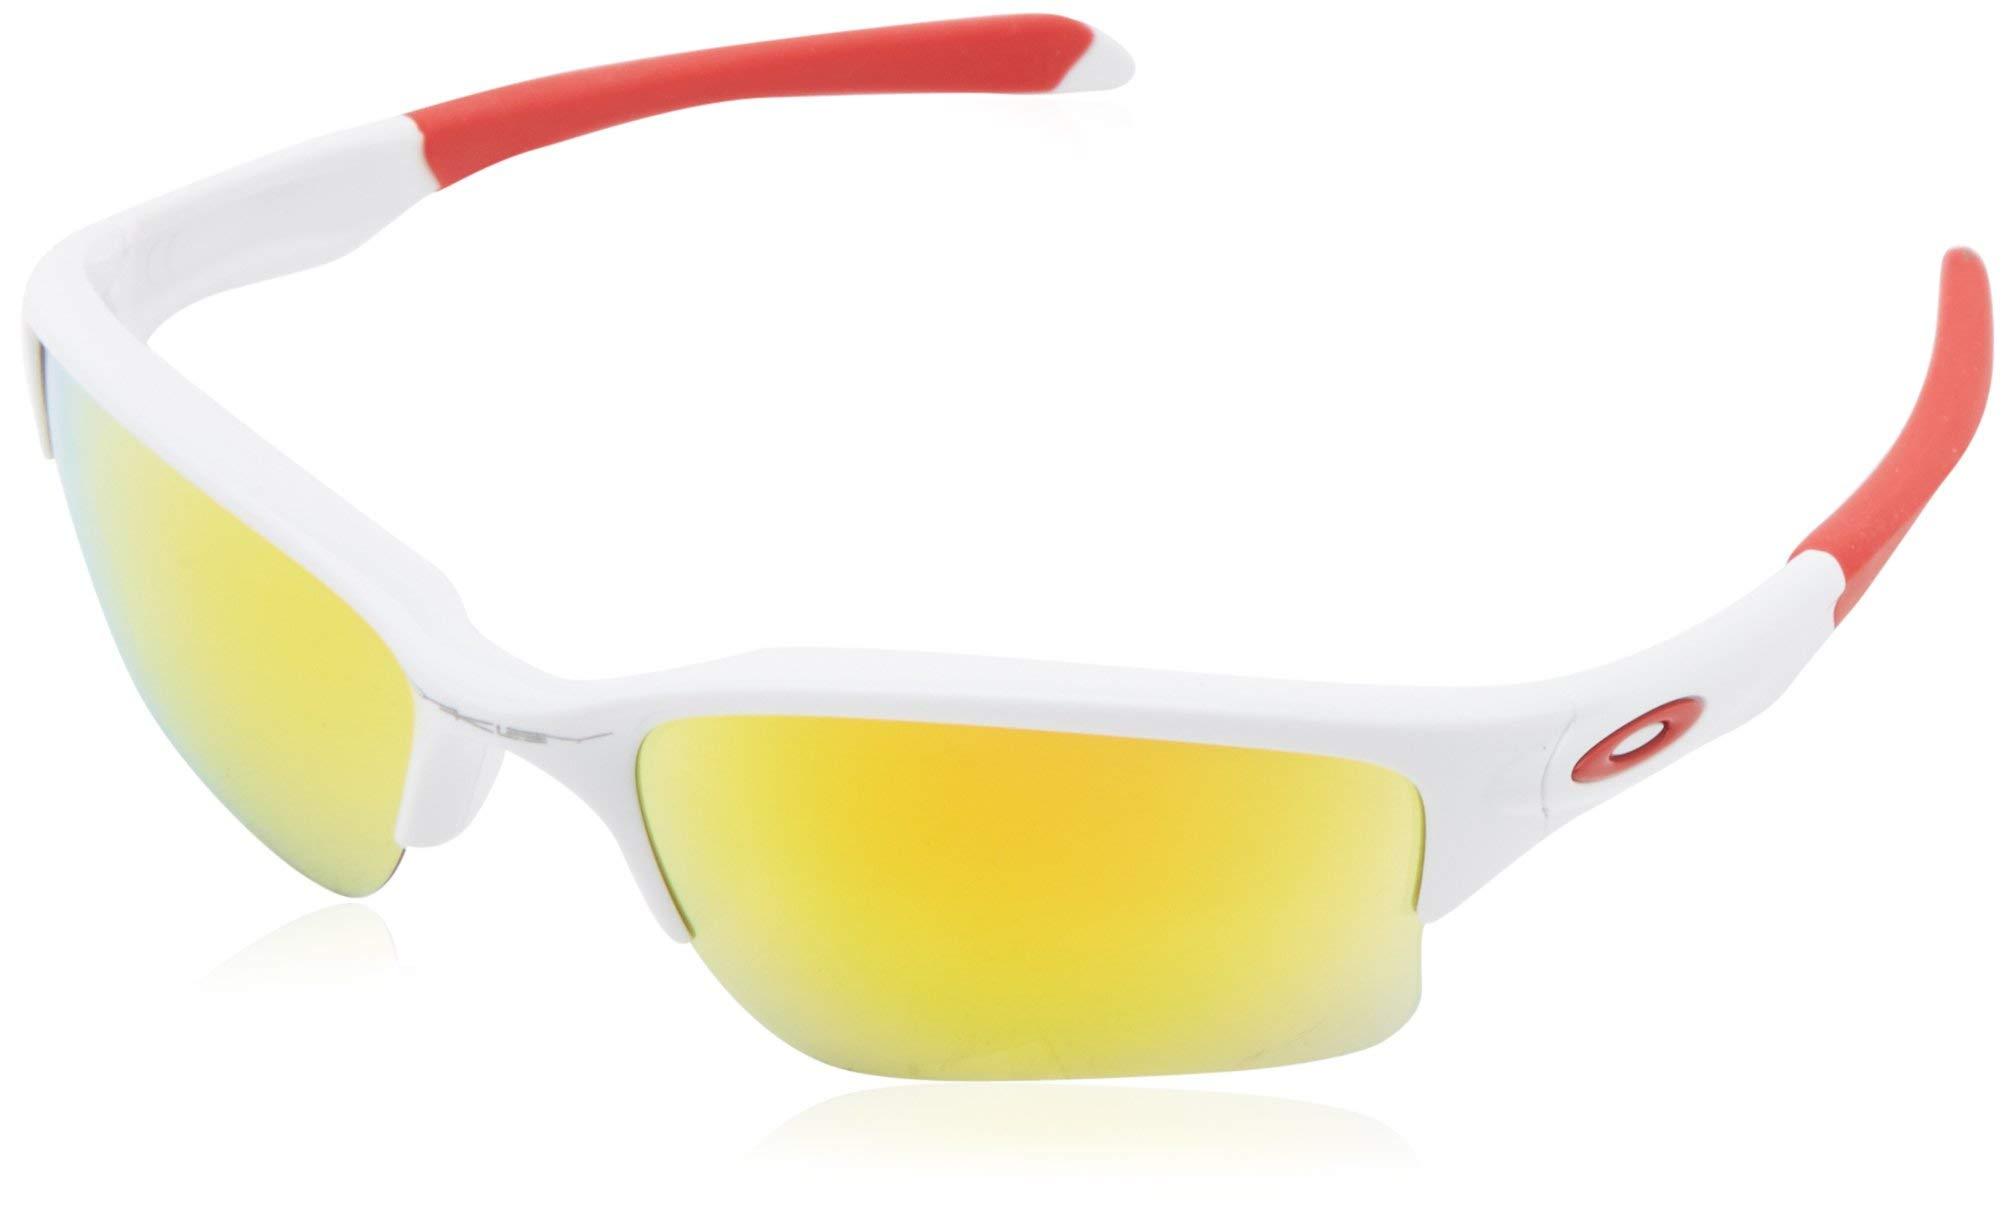 Oakley Men's OO9200 Quarter Jacket Rectangular Sunglasses, Polished White/Fire Iridium, 61 mm by Oakley